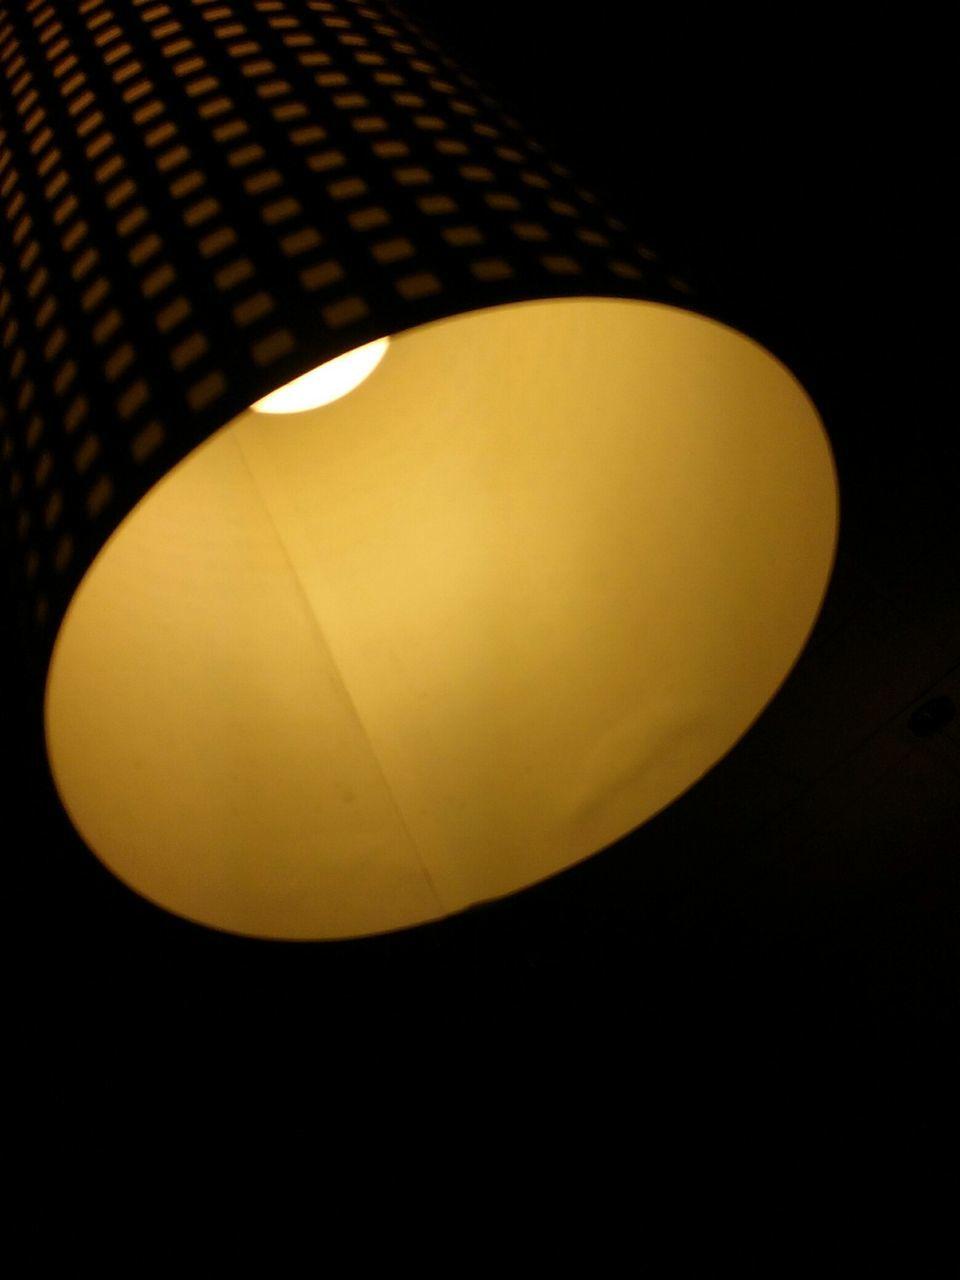 illuminated, lighting equipment, studio shot, black background, no people, night, close-up, yellow, lamp shade, indoors, low angle view